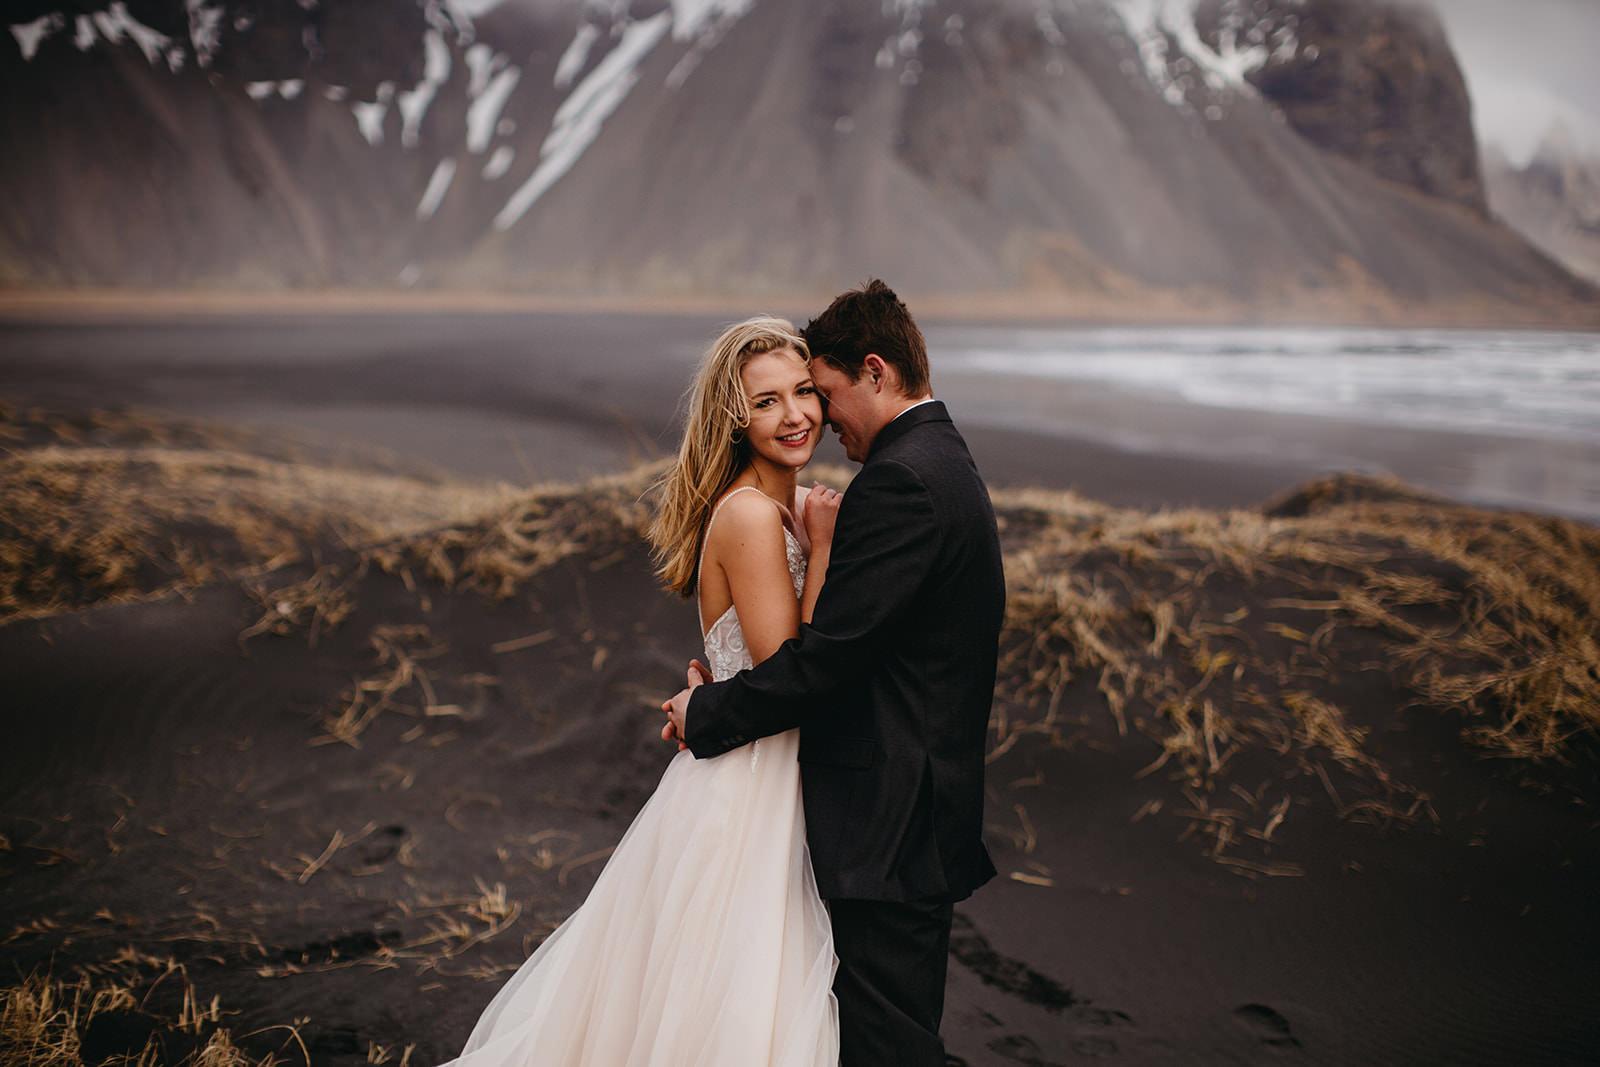 Icelandic Iceland Elopement Wedding Elope Photographer Eloping Reykjavík Vik Black Sand Beach Jökulsárlón Skogafoss Waterfall Vestrahorn Mountain Liz Osban Photography Destination 36.jpg